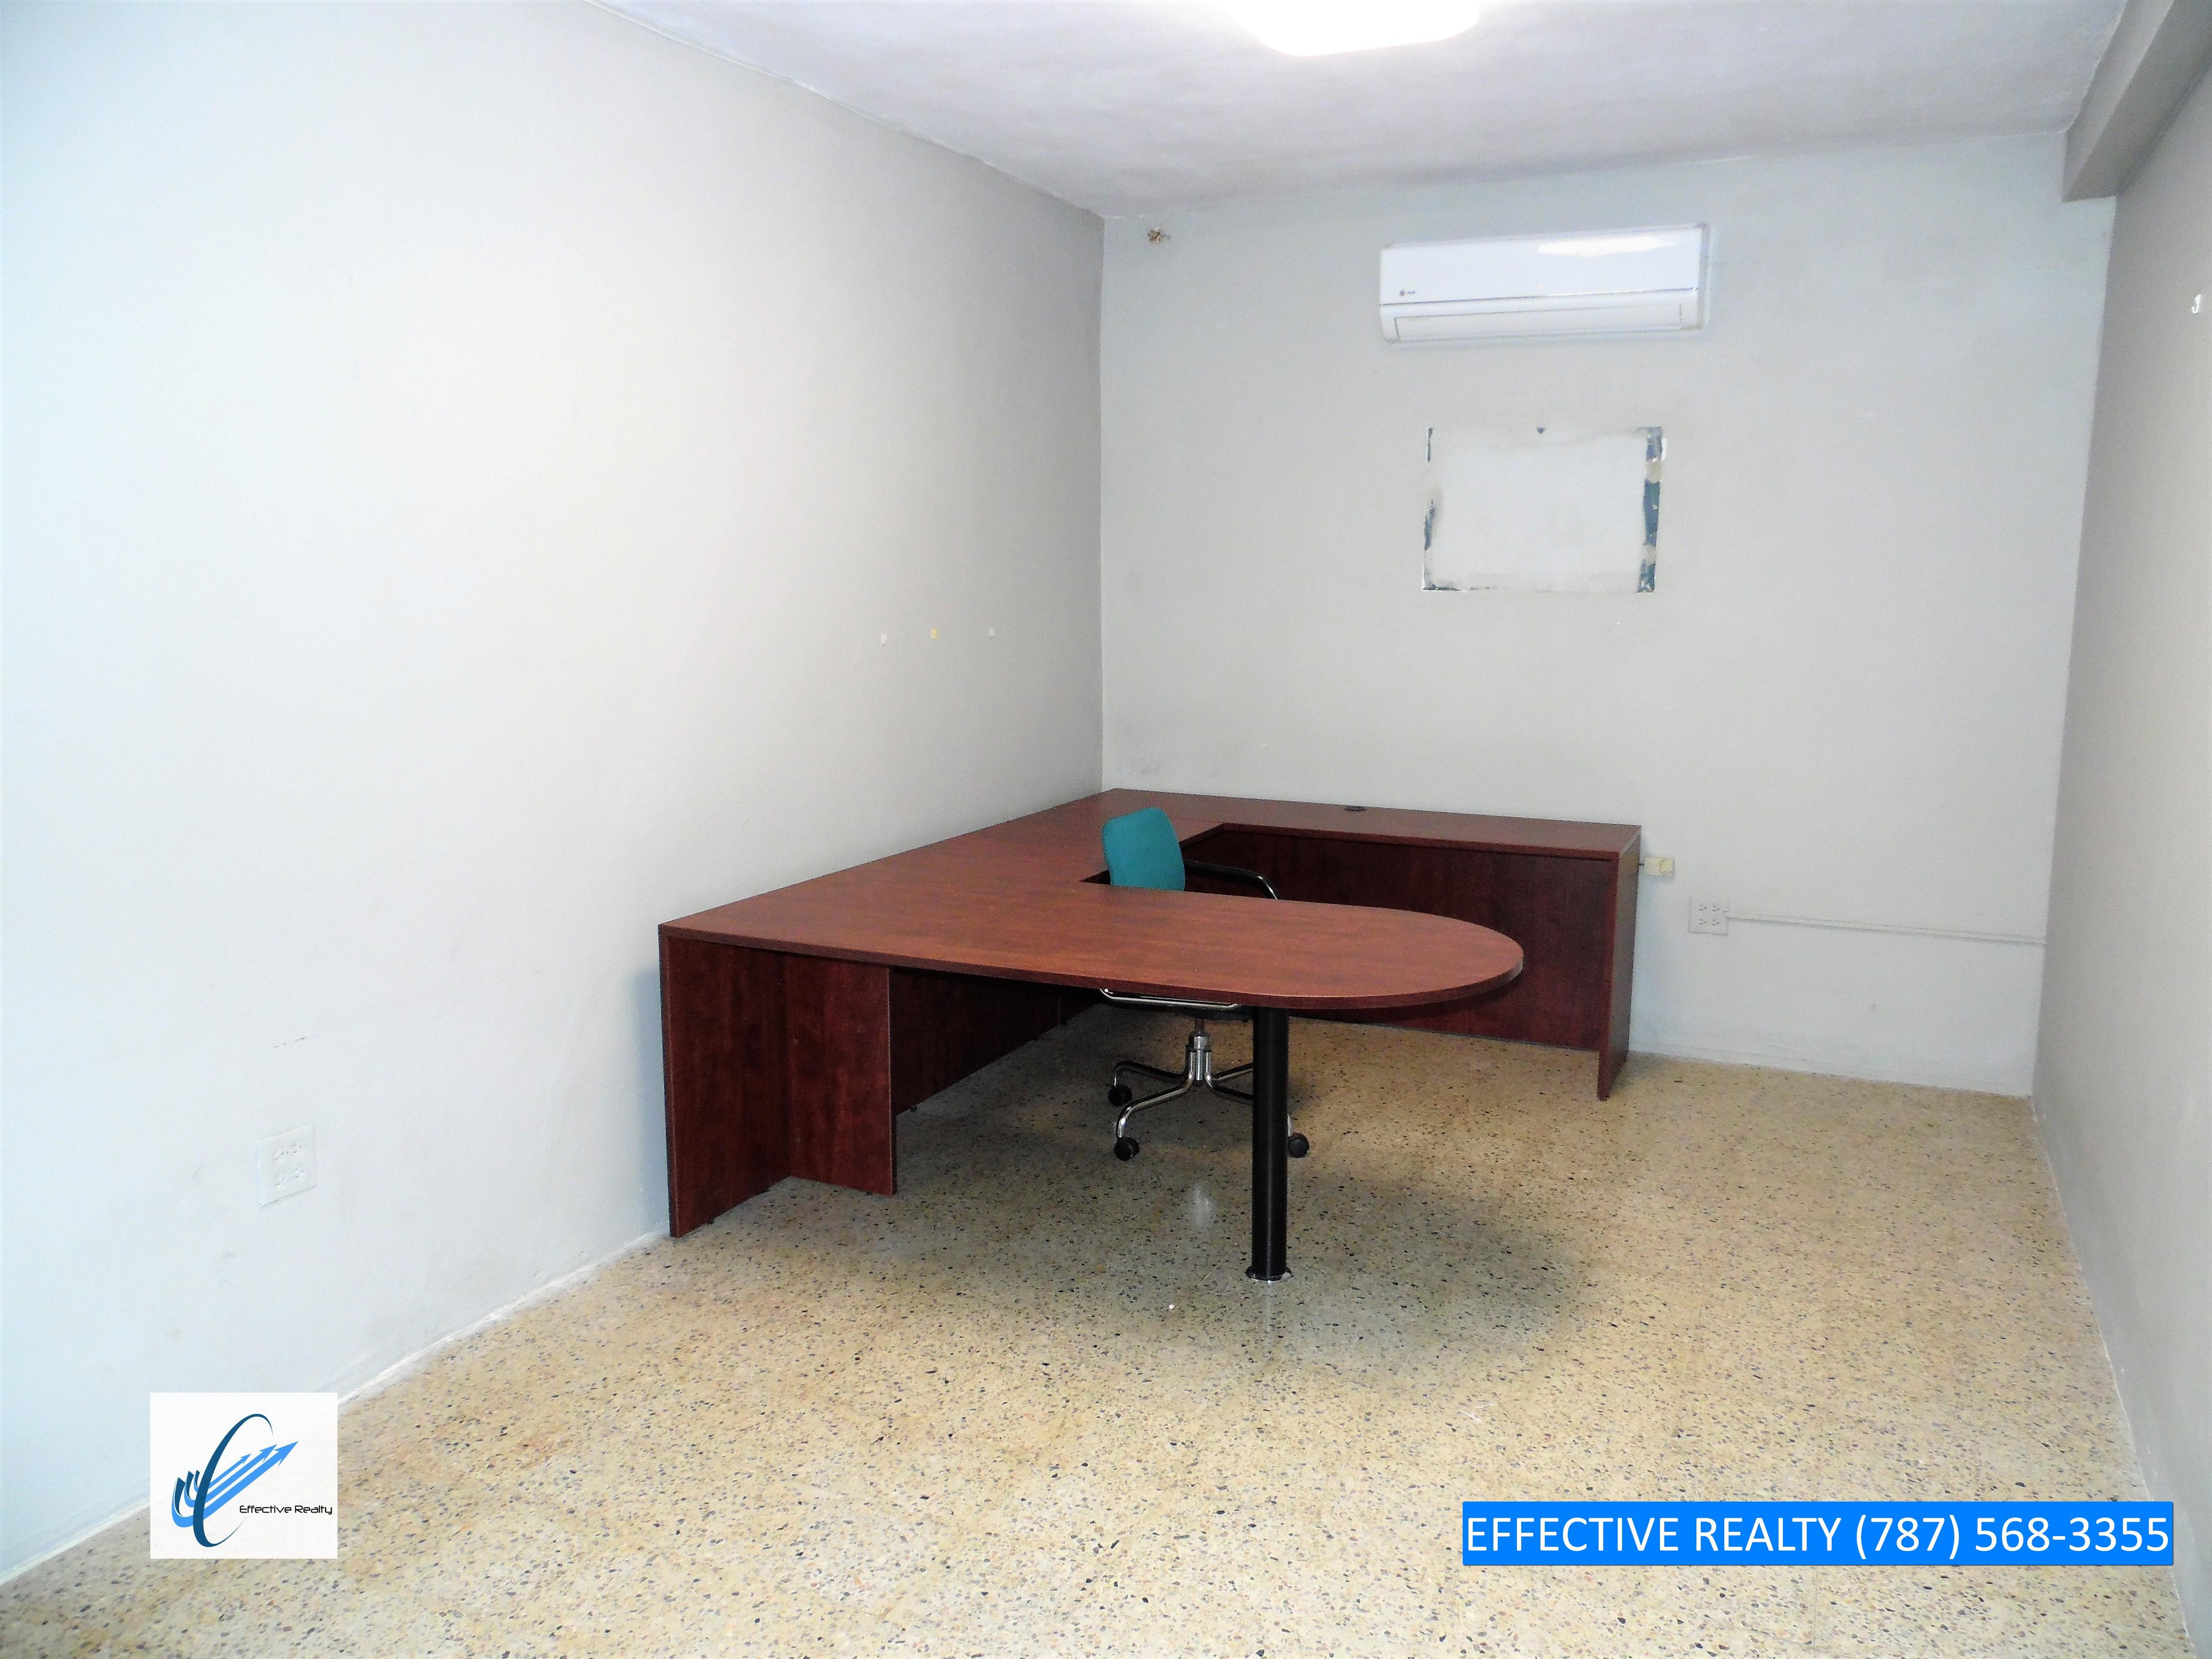 Oficina 1 local 1